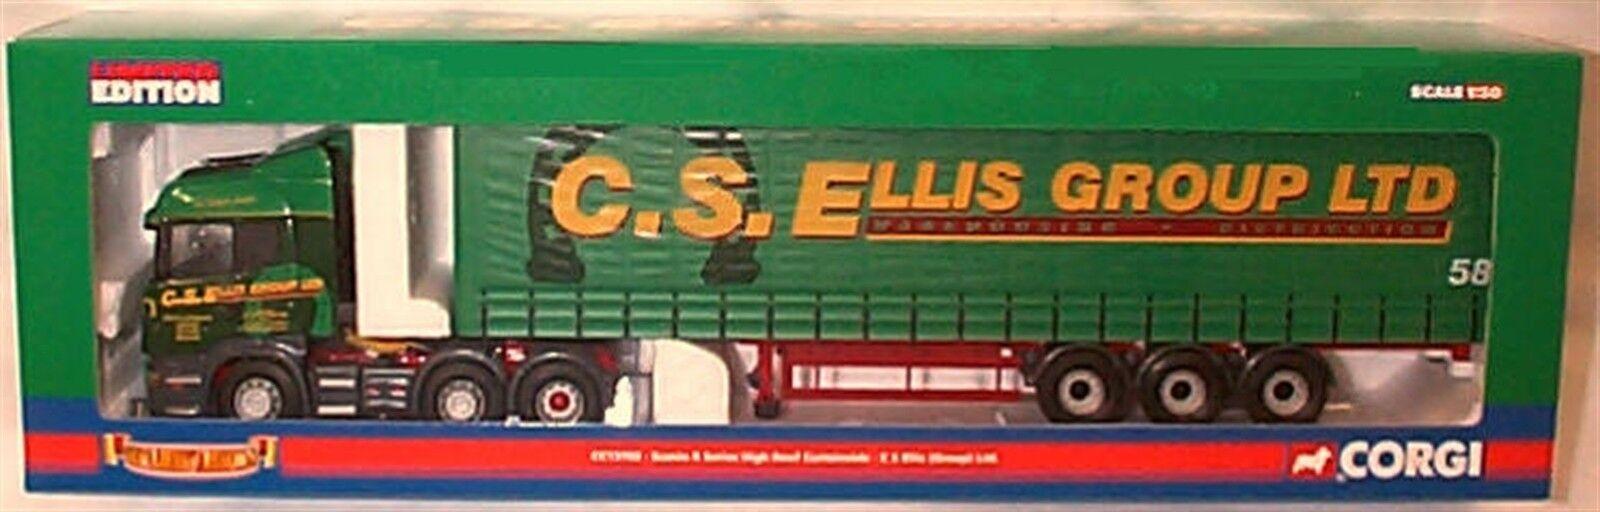 Scania R Series High Roof Curtainside C S Ellis ltd ed CC13703